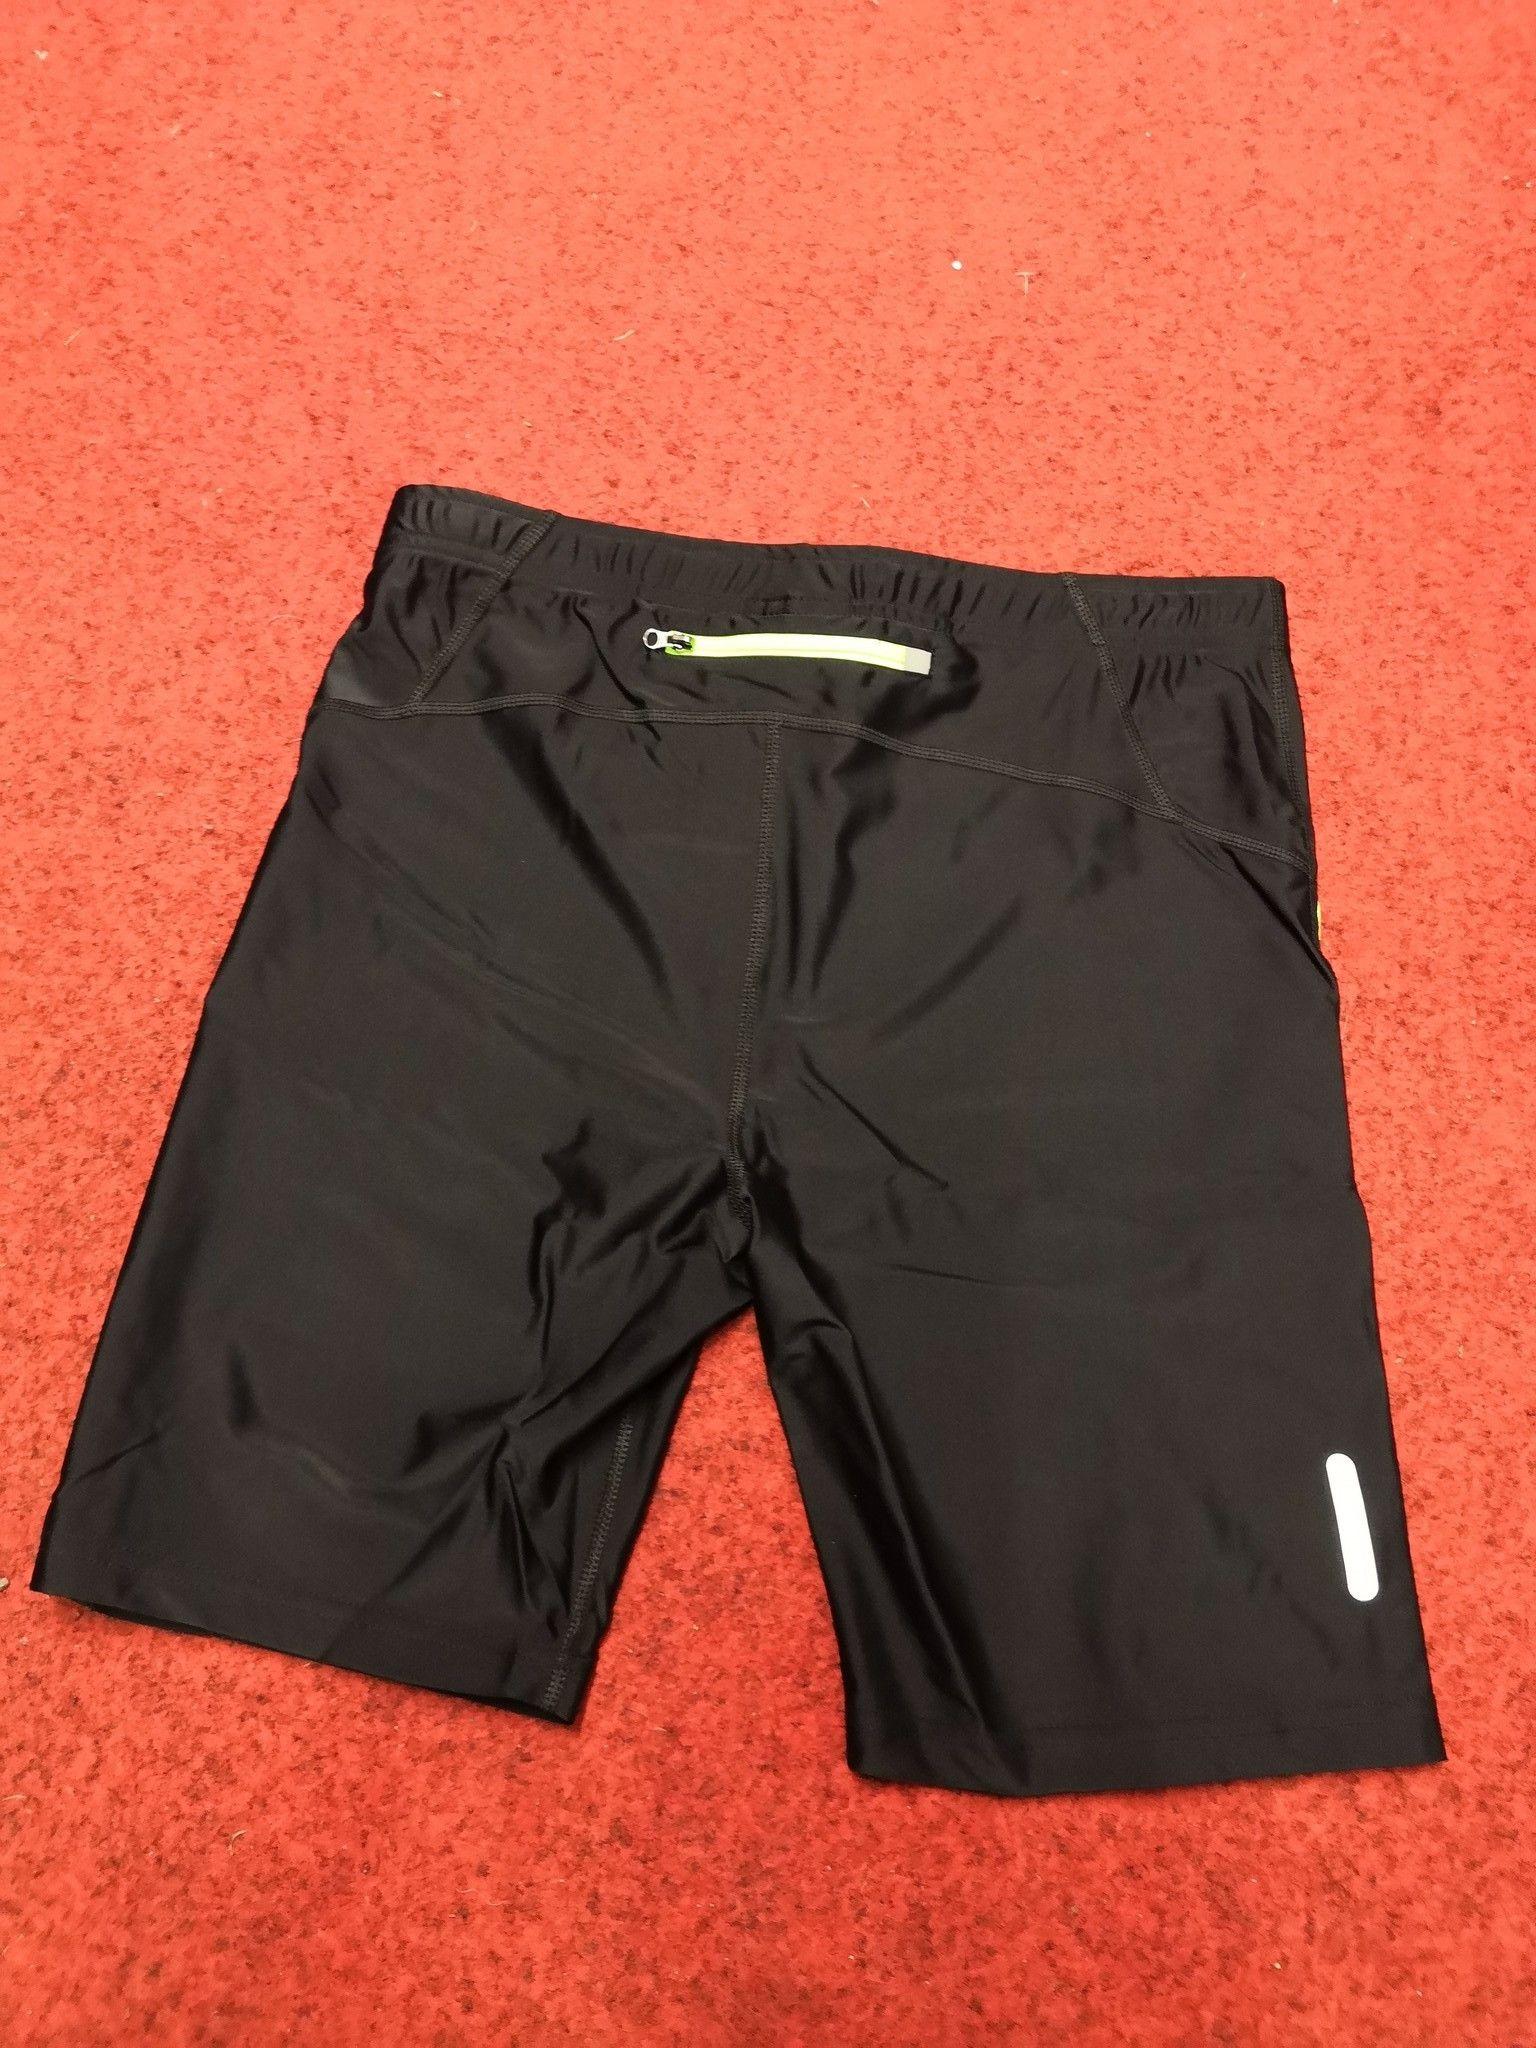 Shop Uomo Pantaloncini Abbigliamento Sport Brugi Pantaloni 7P4apP